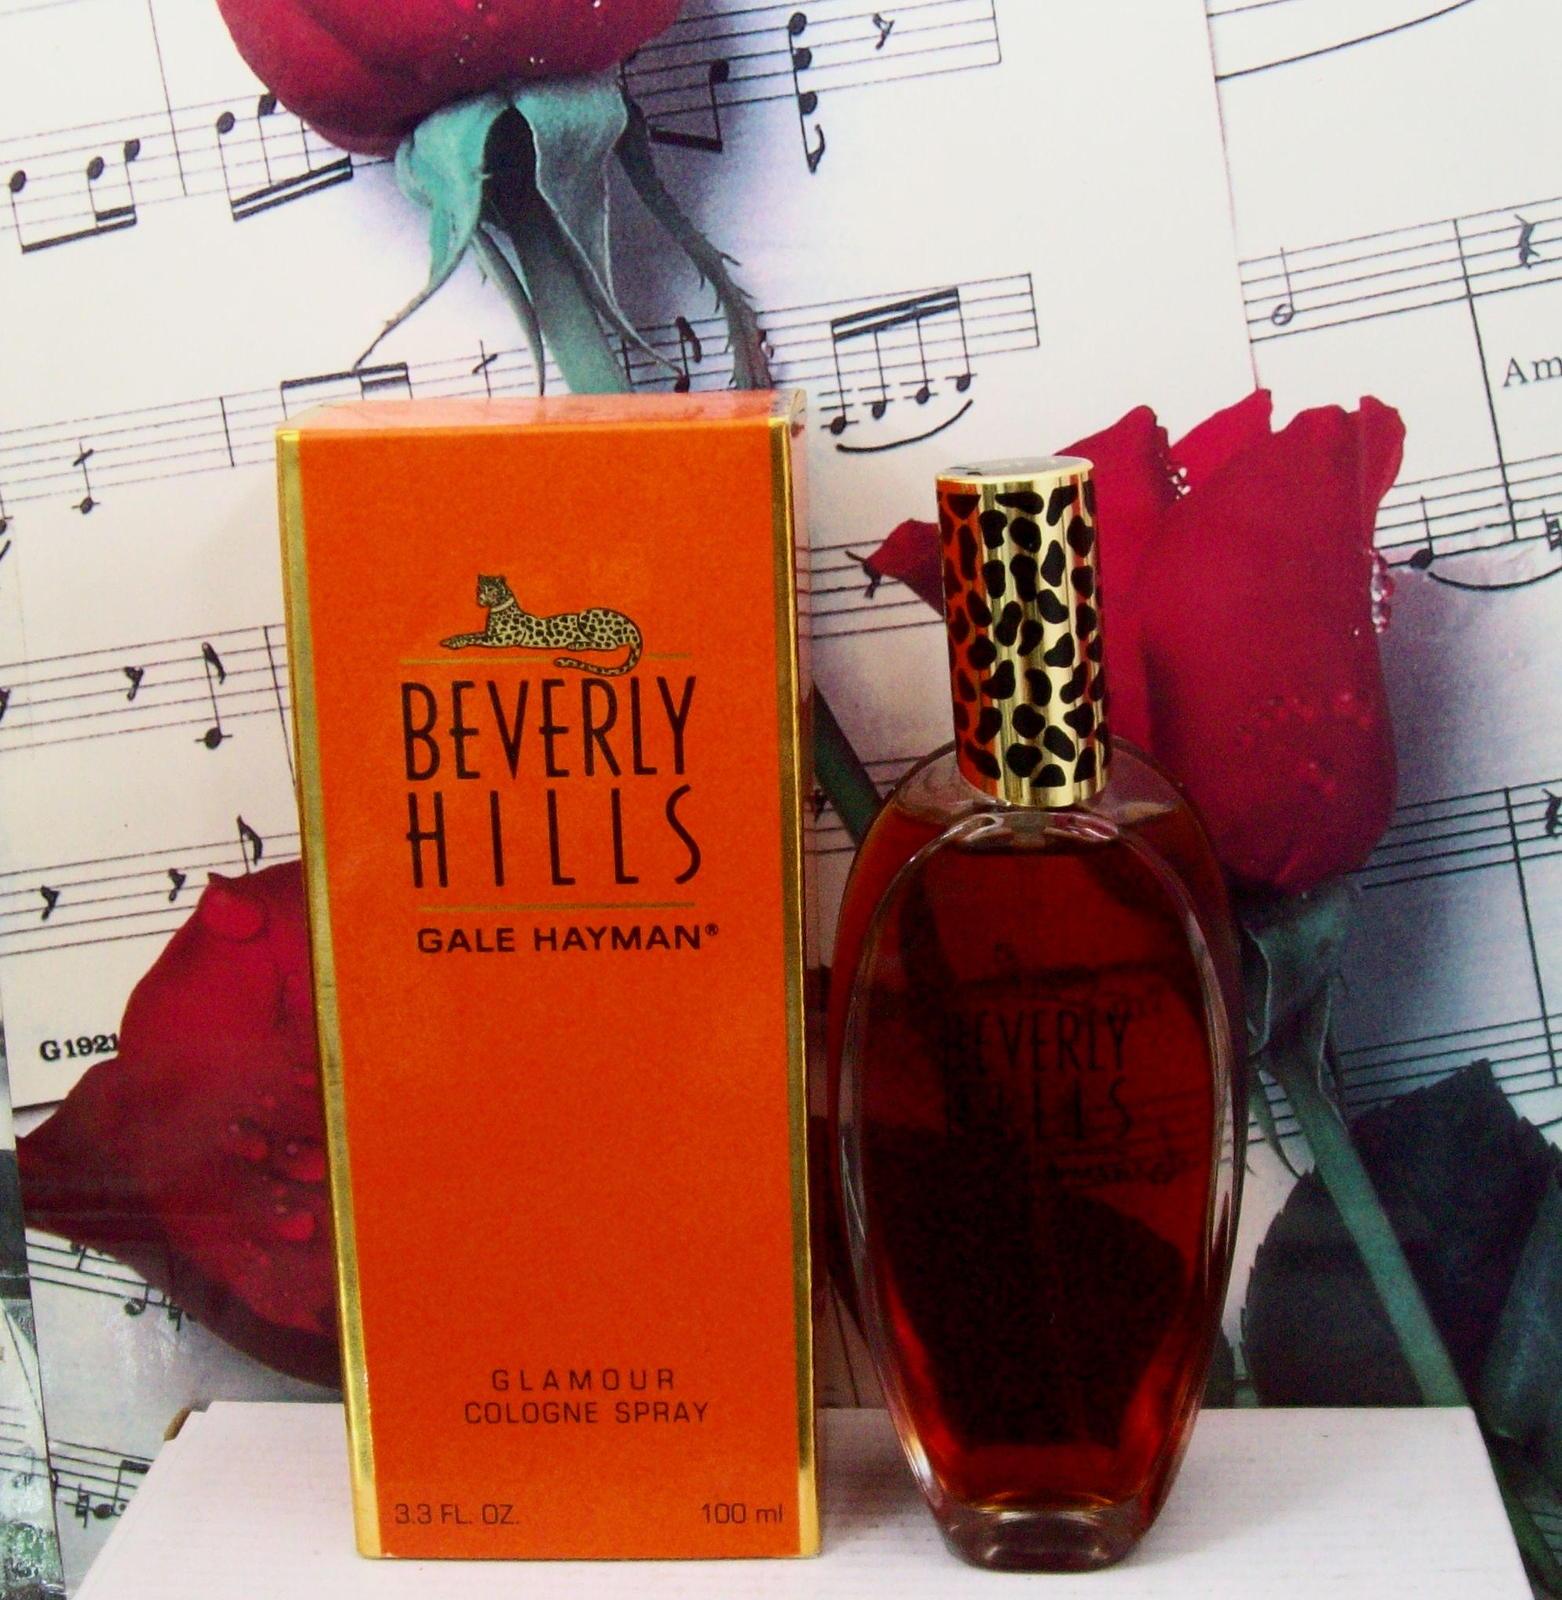 Gale Hayman Beverly Hills Glamour Cologne Spray 3.3 FL. OZ. - $89.99